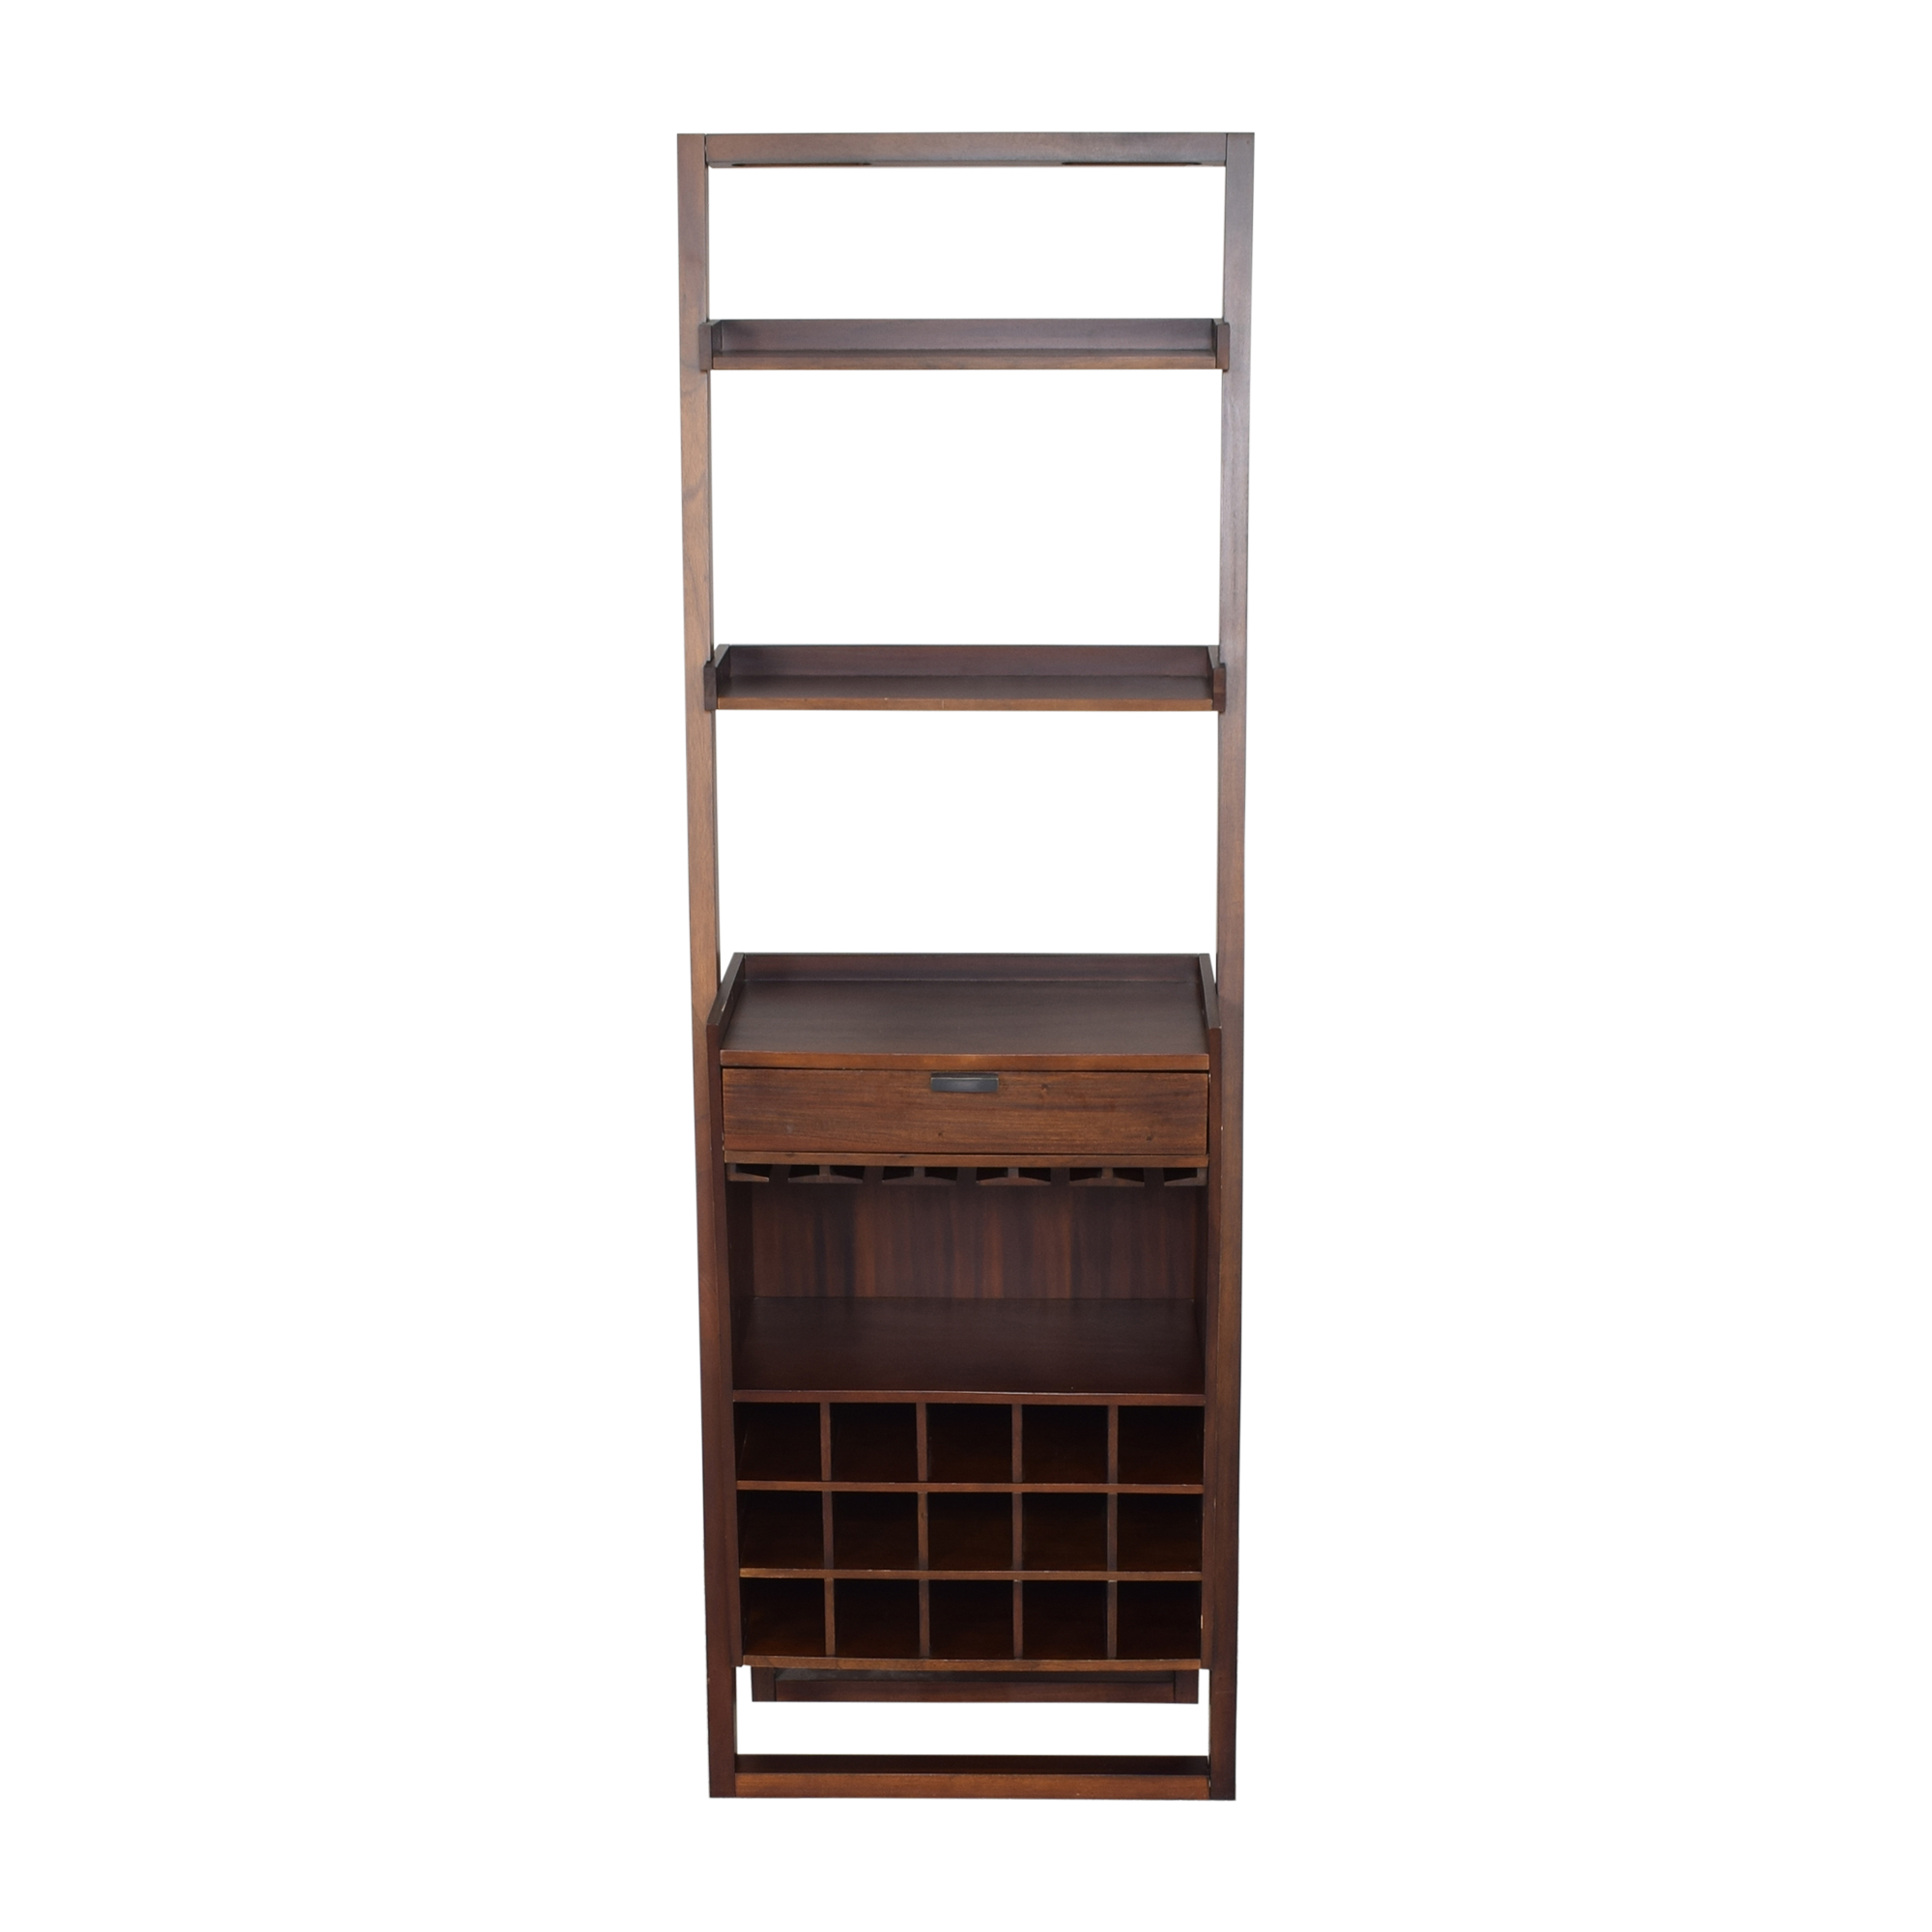 Crate & Barrel Sloane Leaning Wine Bar / Storage